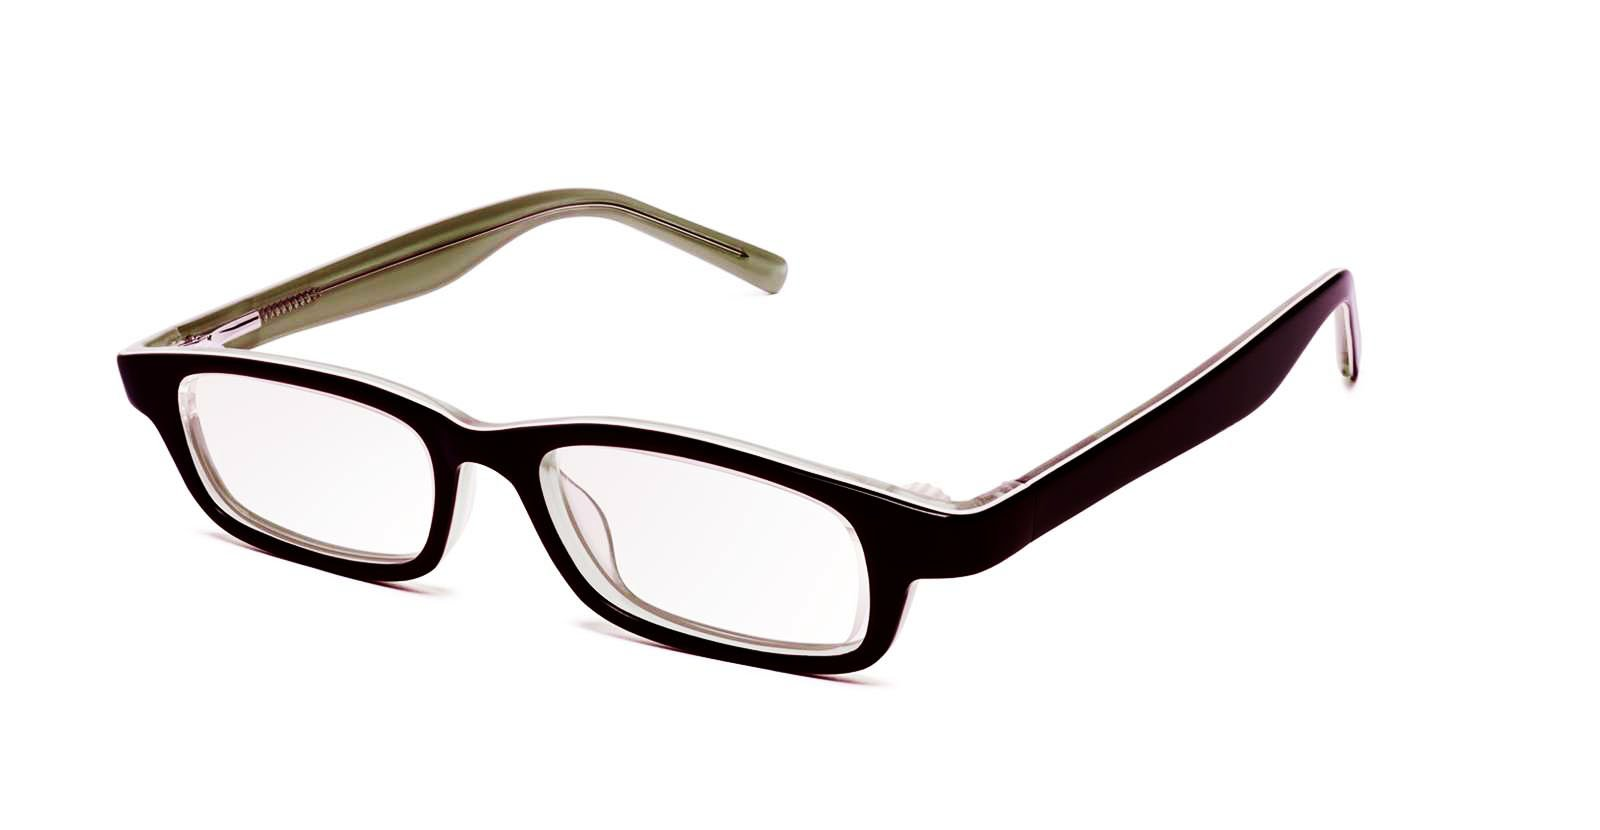 Eyejusters, Self-Adjustable Glasses, Multilayer, Olive & Cream